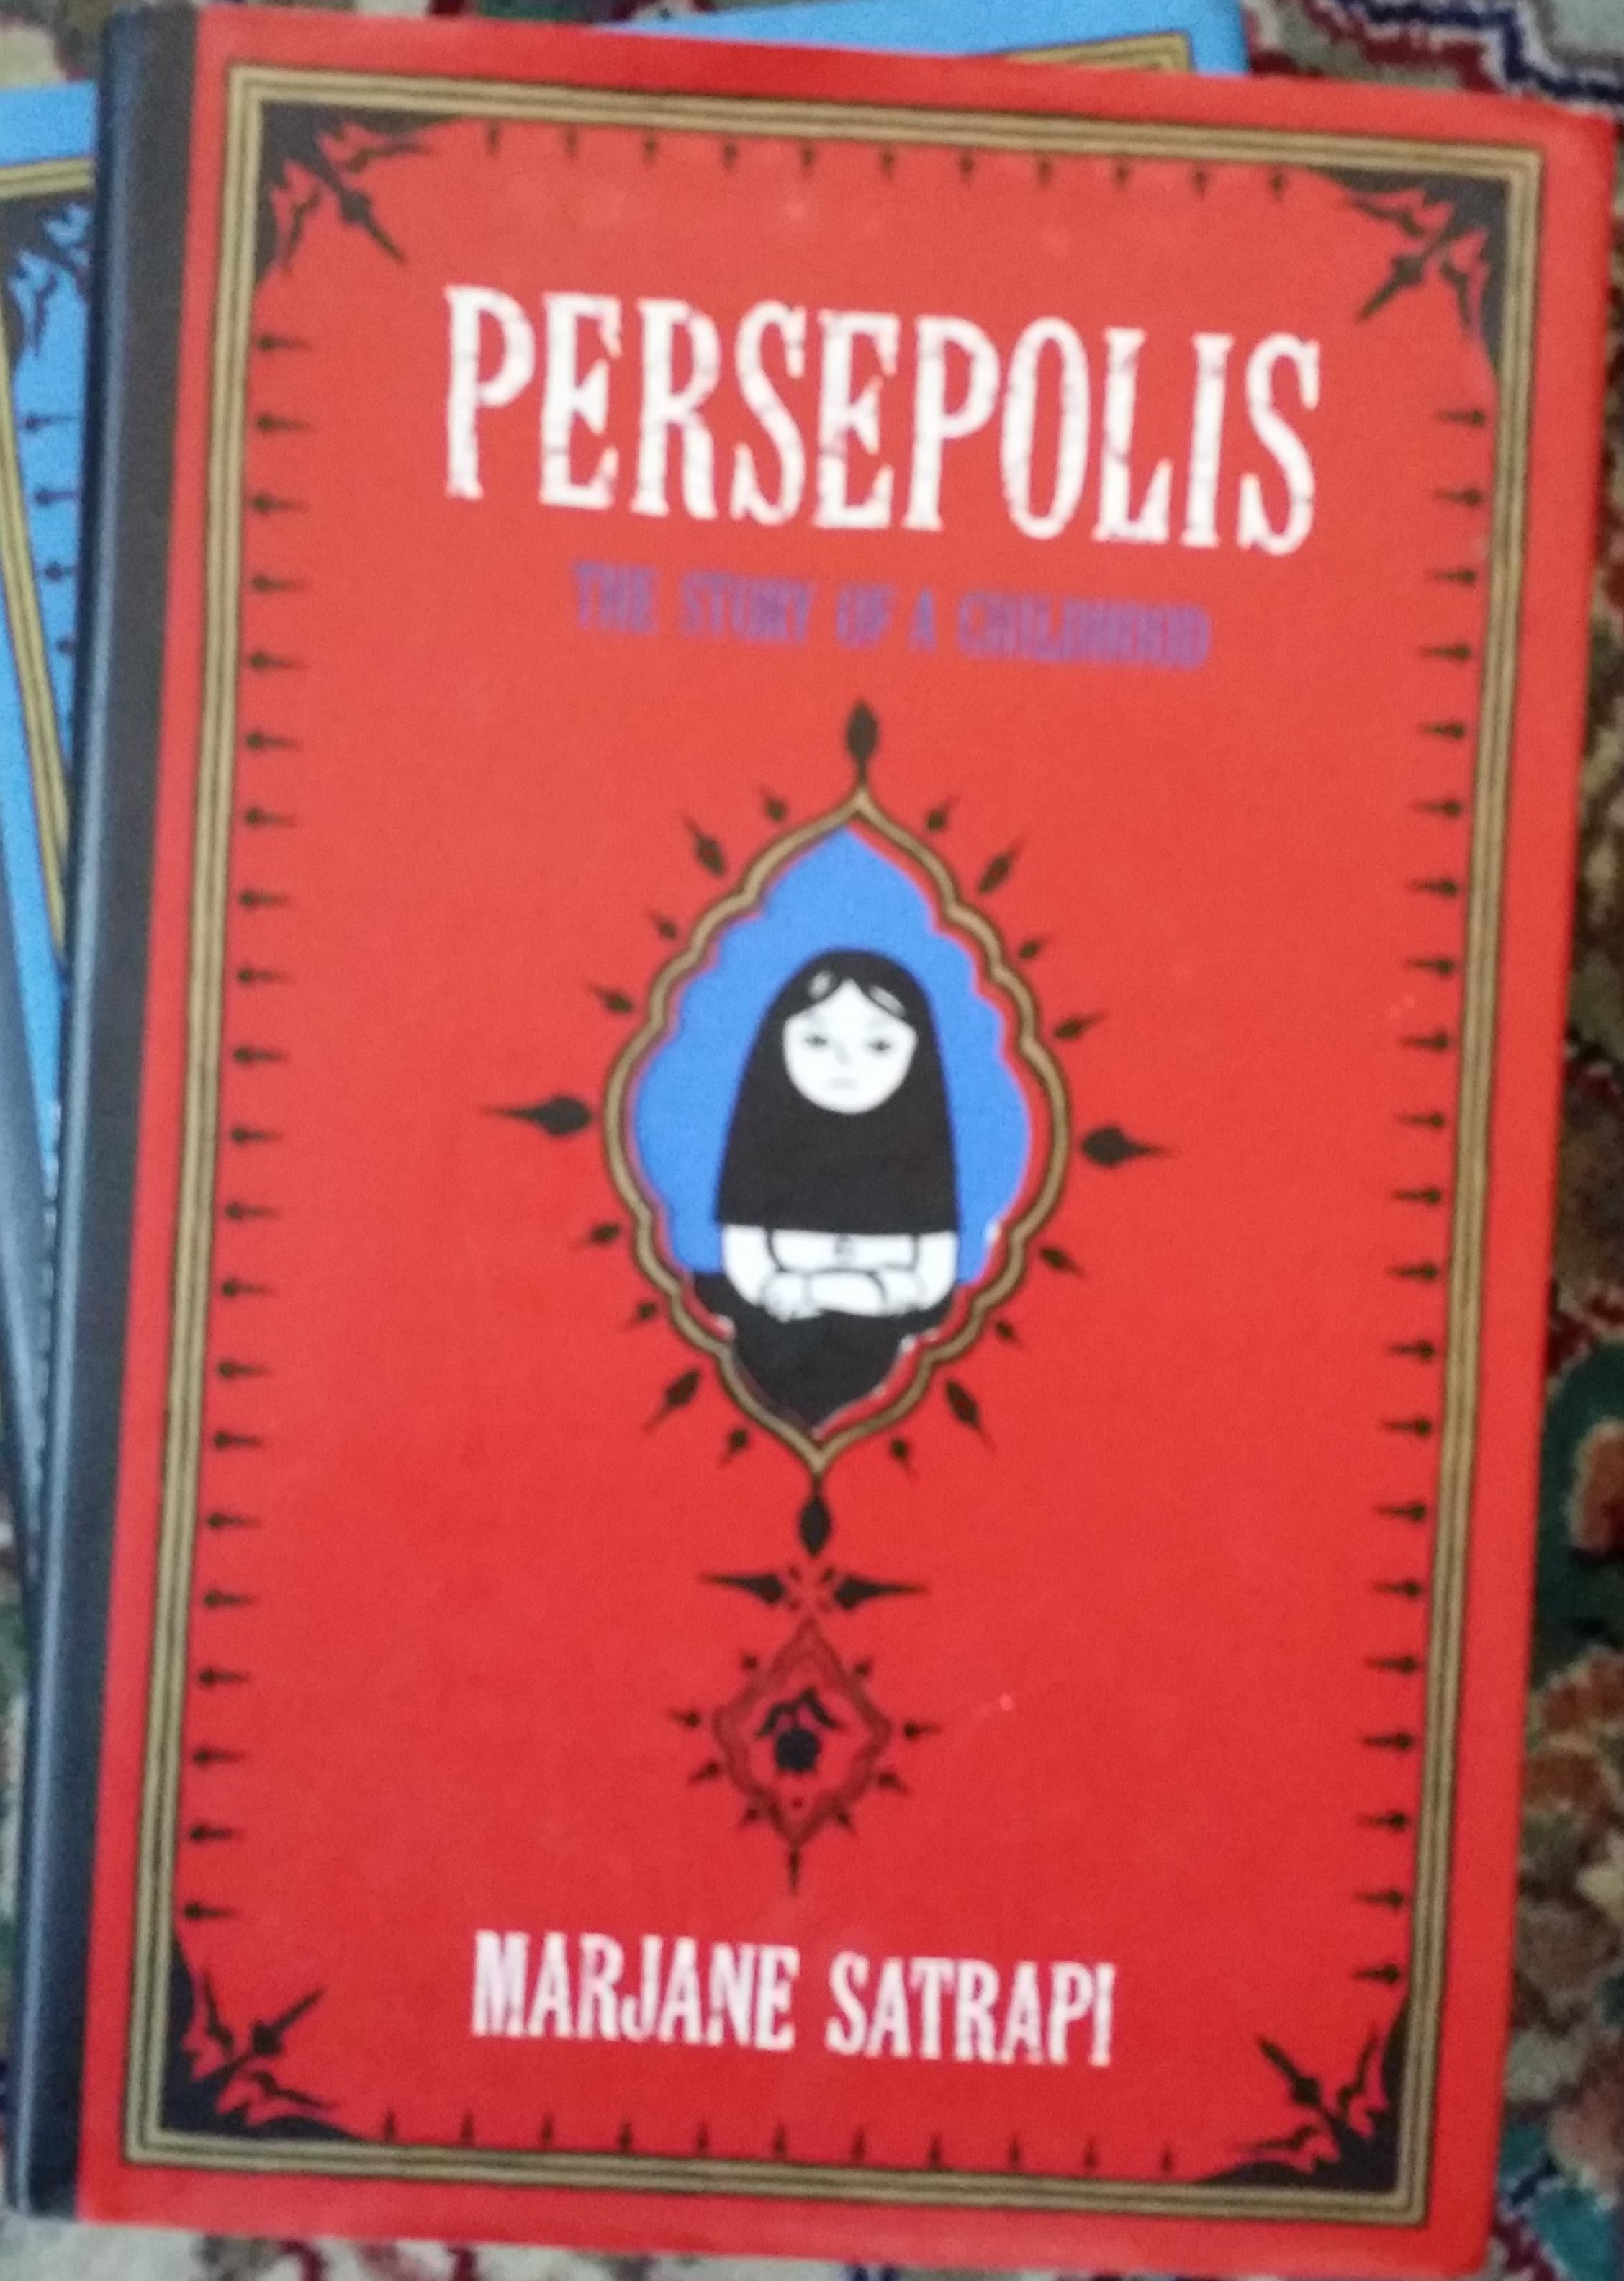 real persian writing to know and love catherine dehdashti persepolis book